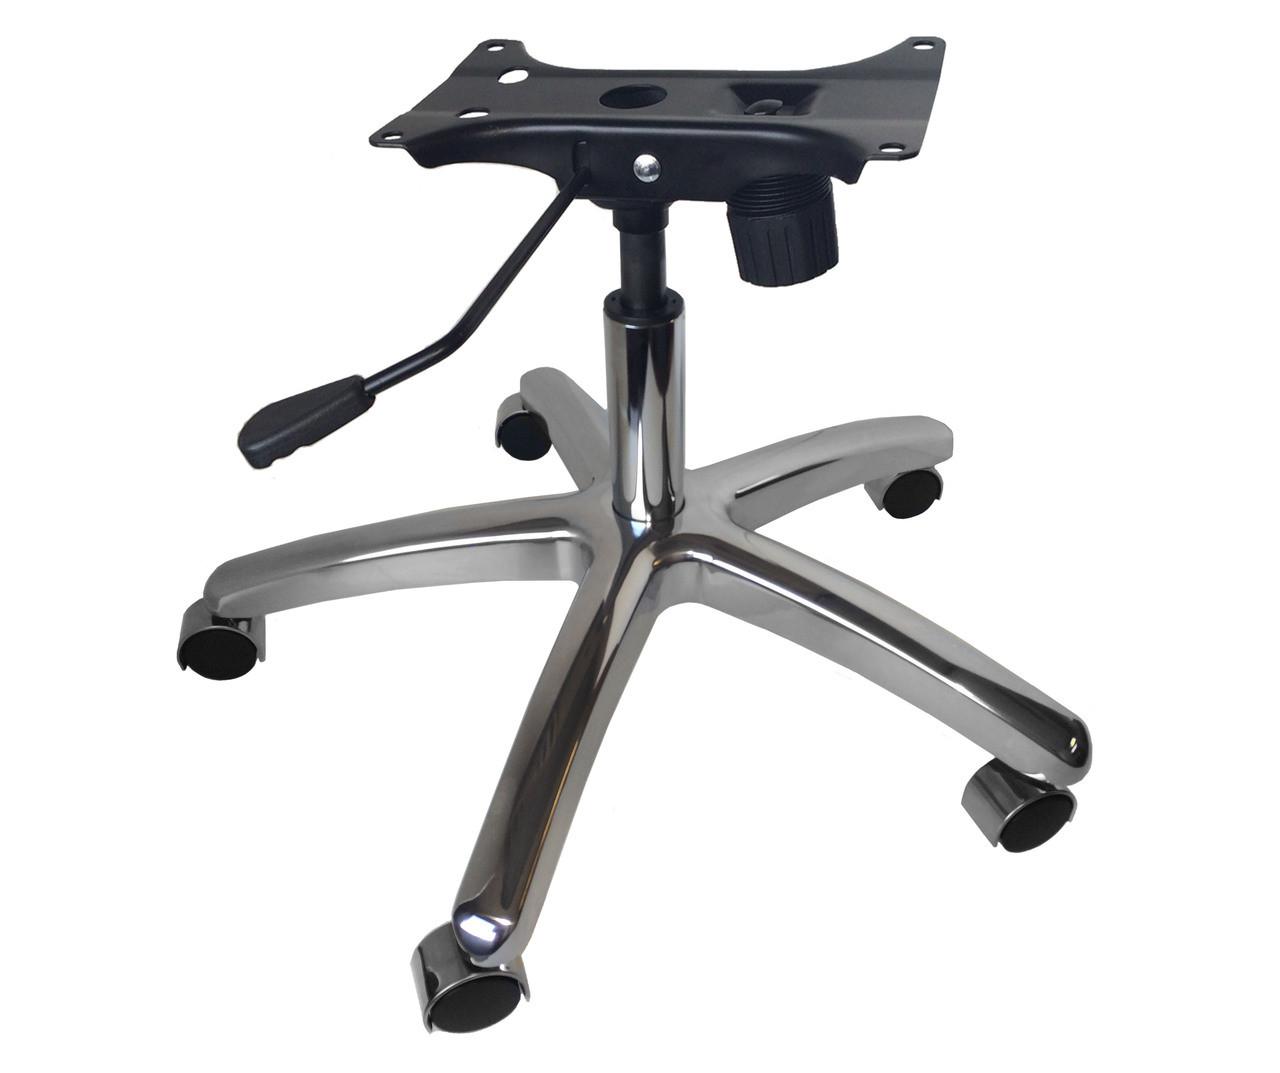 office chair base cover rentals kelowna chrome 26 kit w casters gas lift tilt mechanism